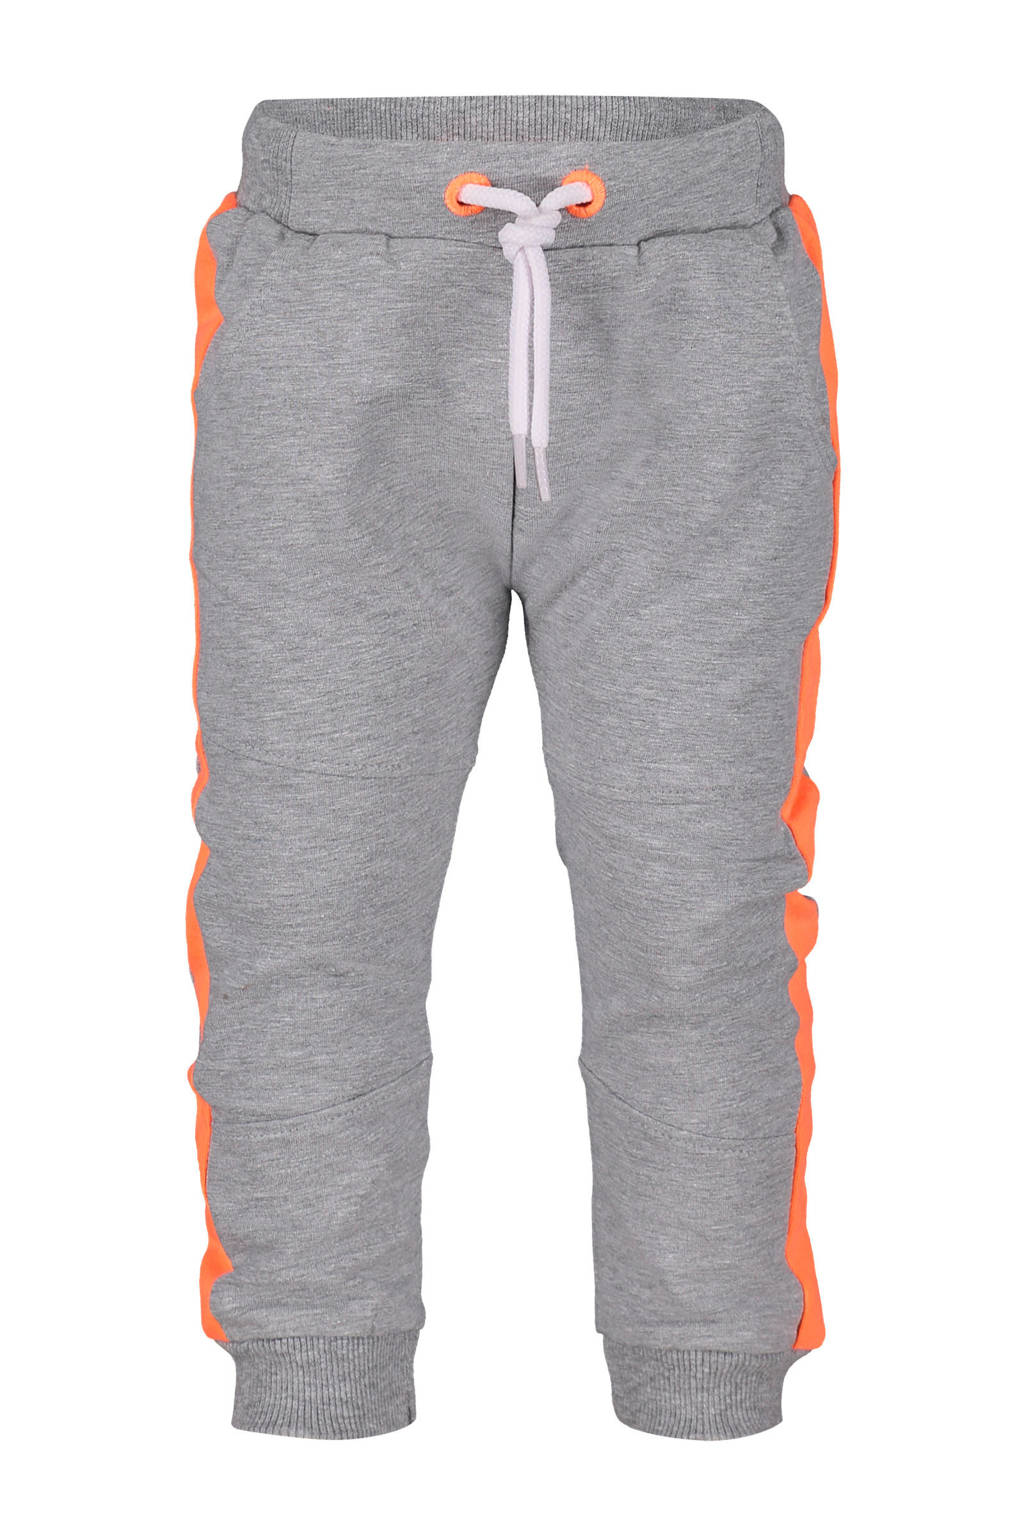 4PRESIDENT regular fit joggingbroek grijs/oranje, Grijs/oranje